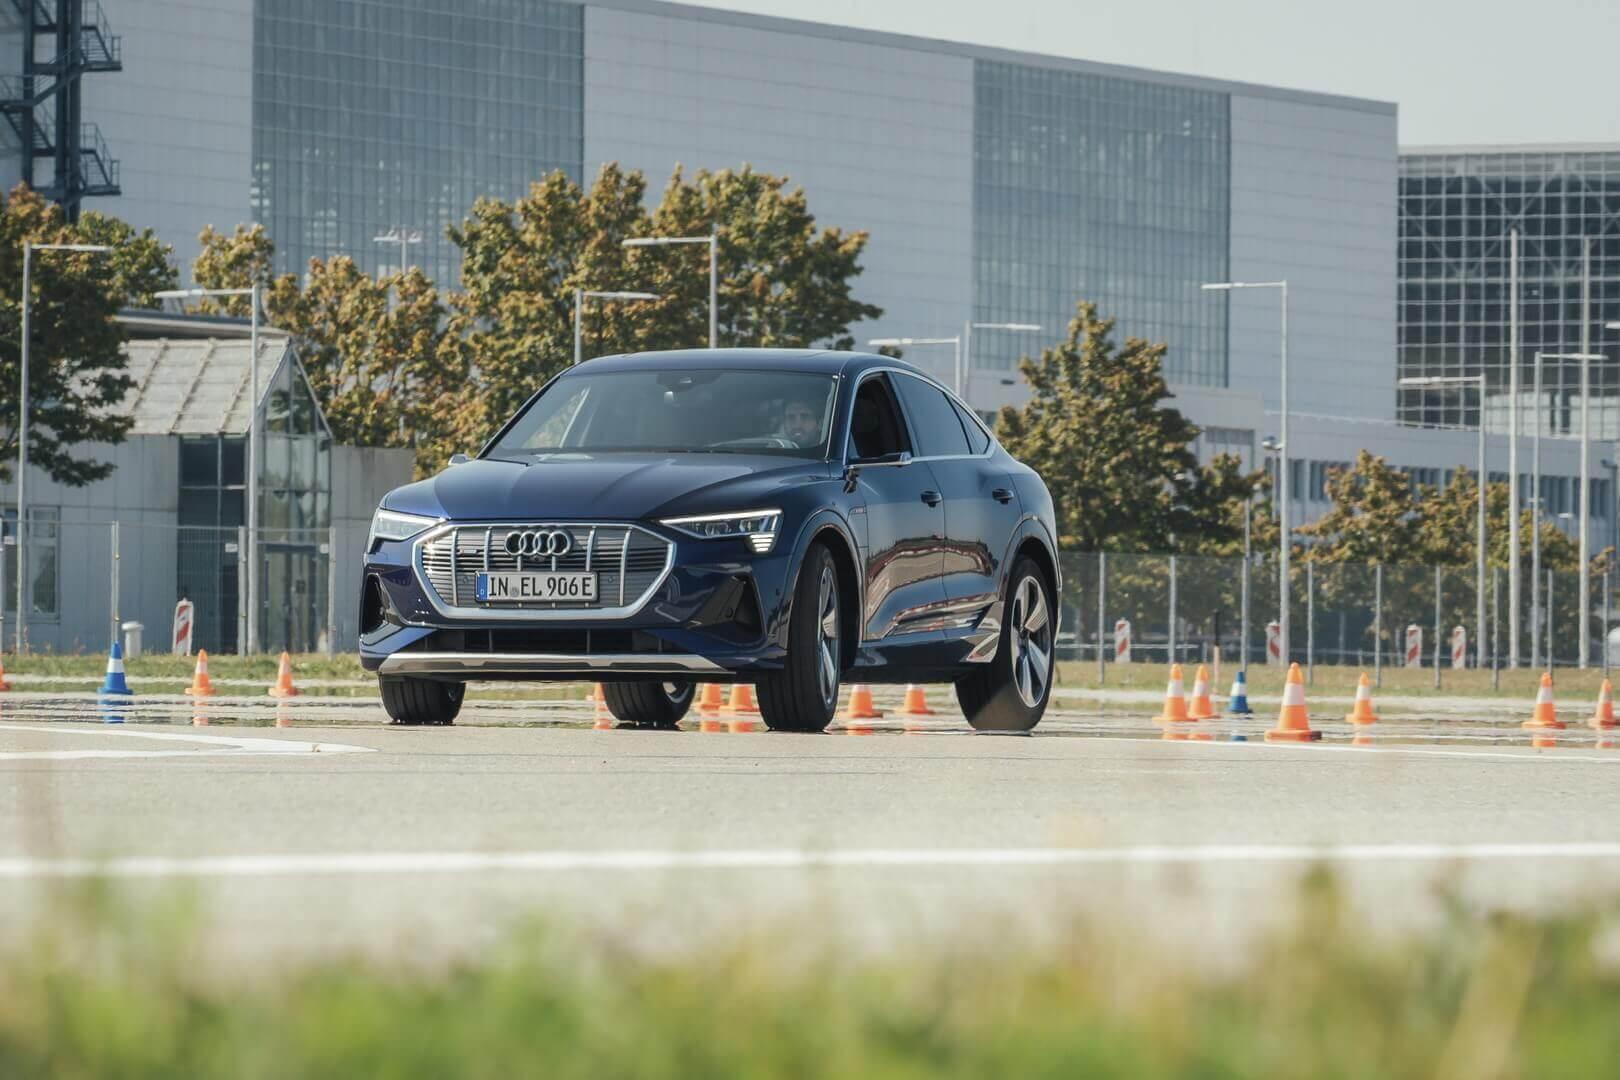 Тест-драйв игроками ФК «Бавария» Audi e-tron Sportback